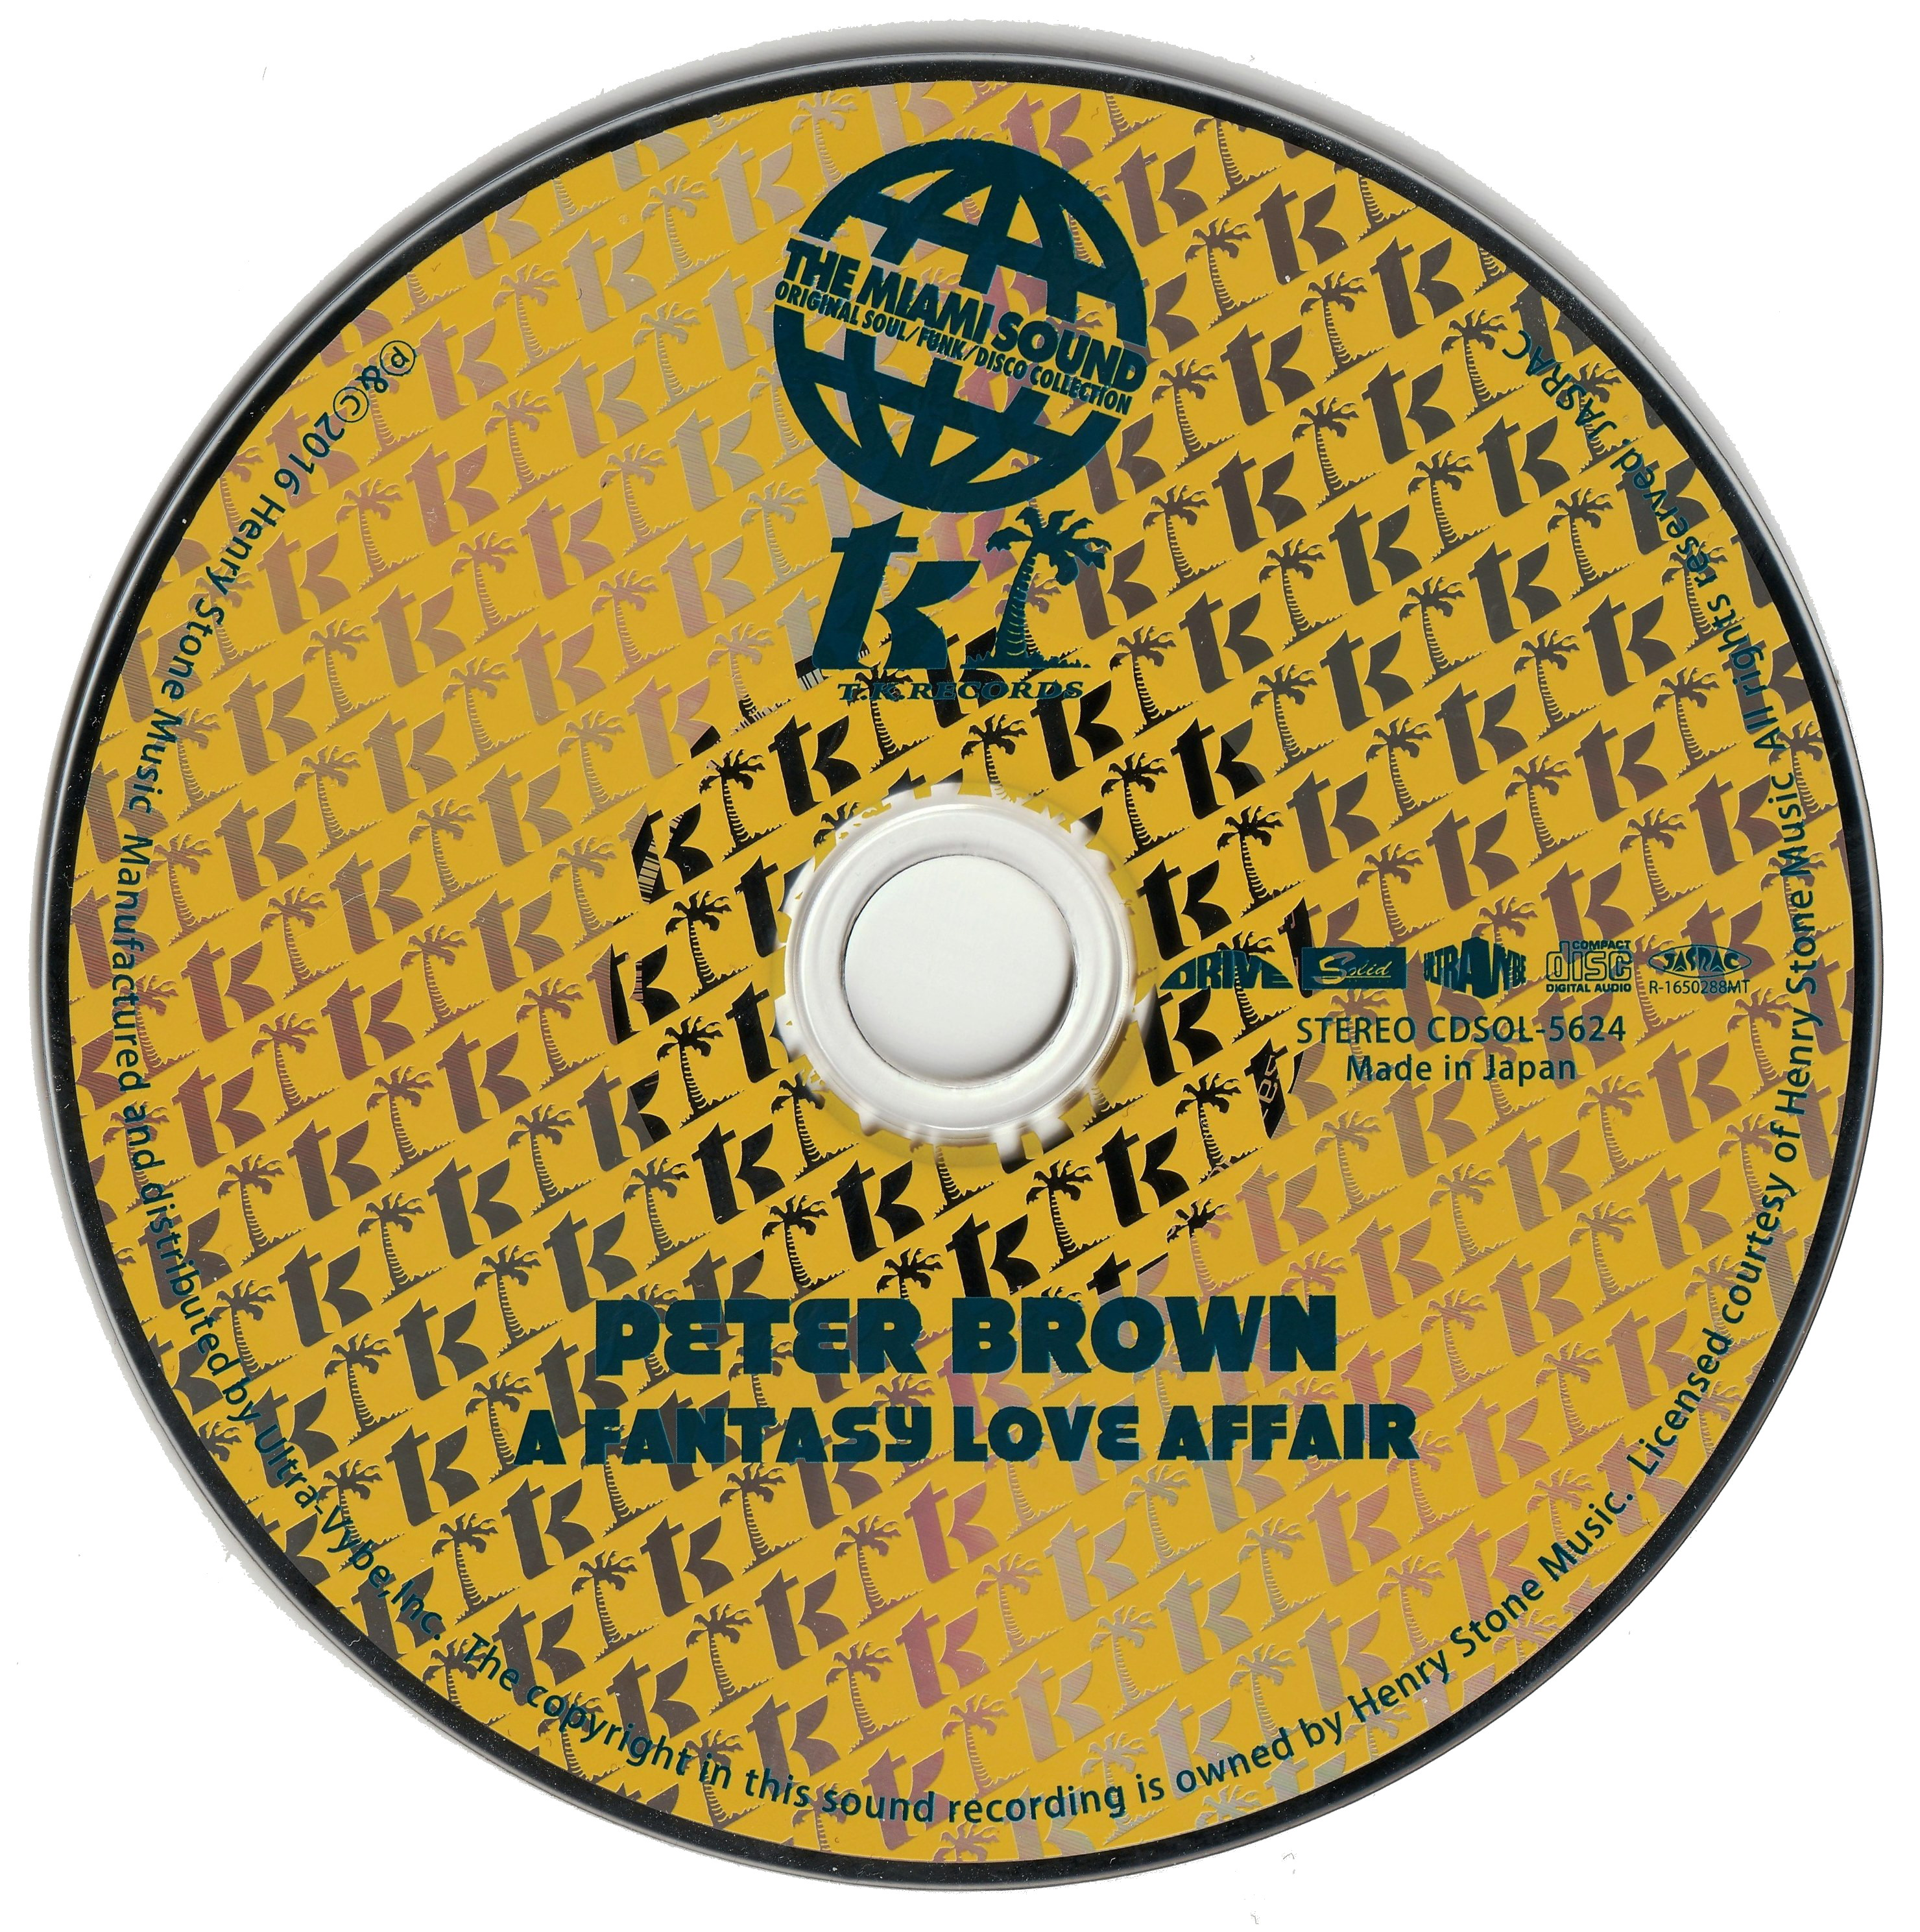 Peter Brown - A Fantasy Love Affair (1977) [2016, Japan]